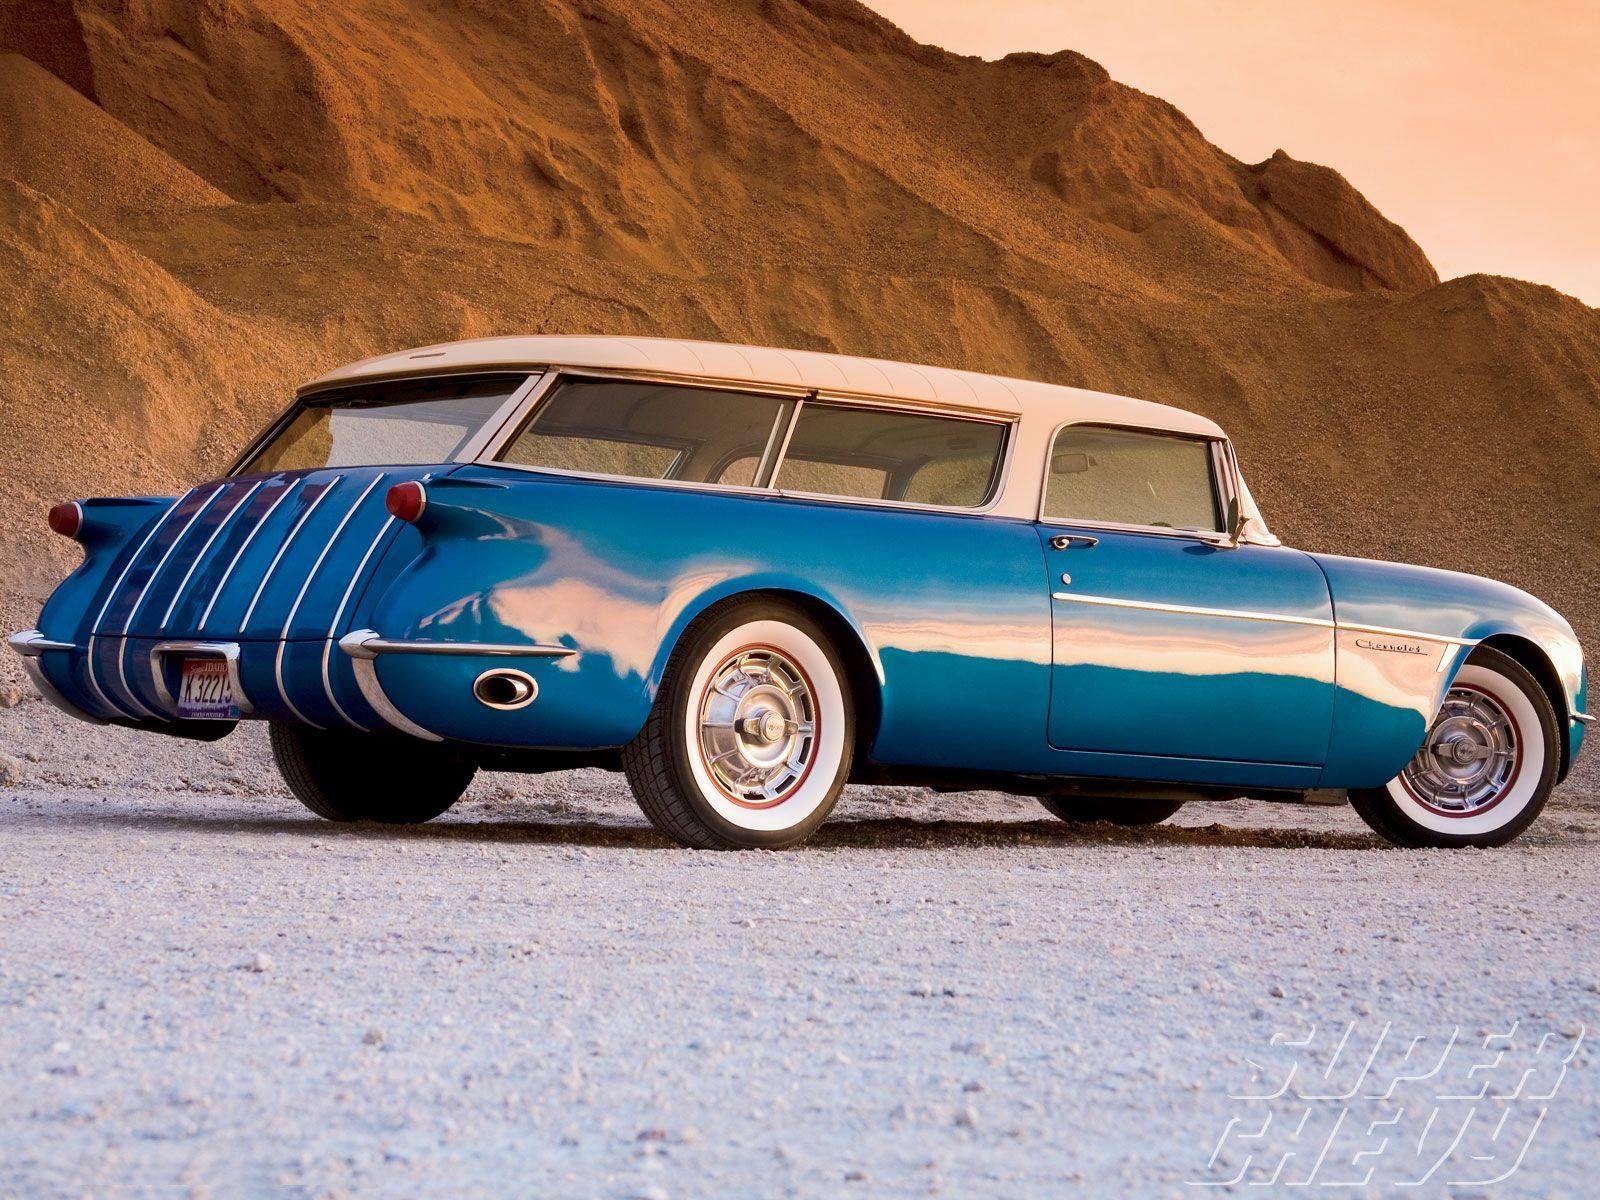 Shooting Brake 1954 Chevrolet Corvette Nomad Concept Car Classic Cars Corvette Chevy Corvette